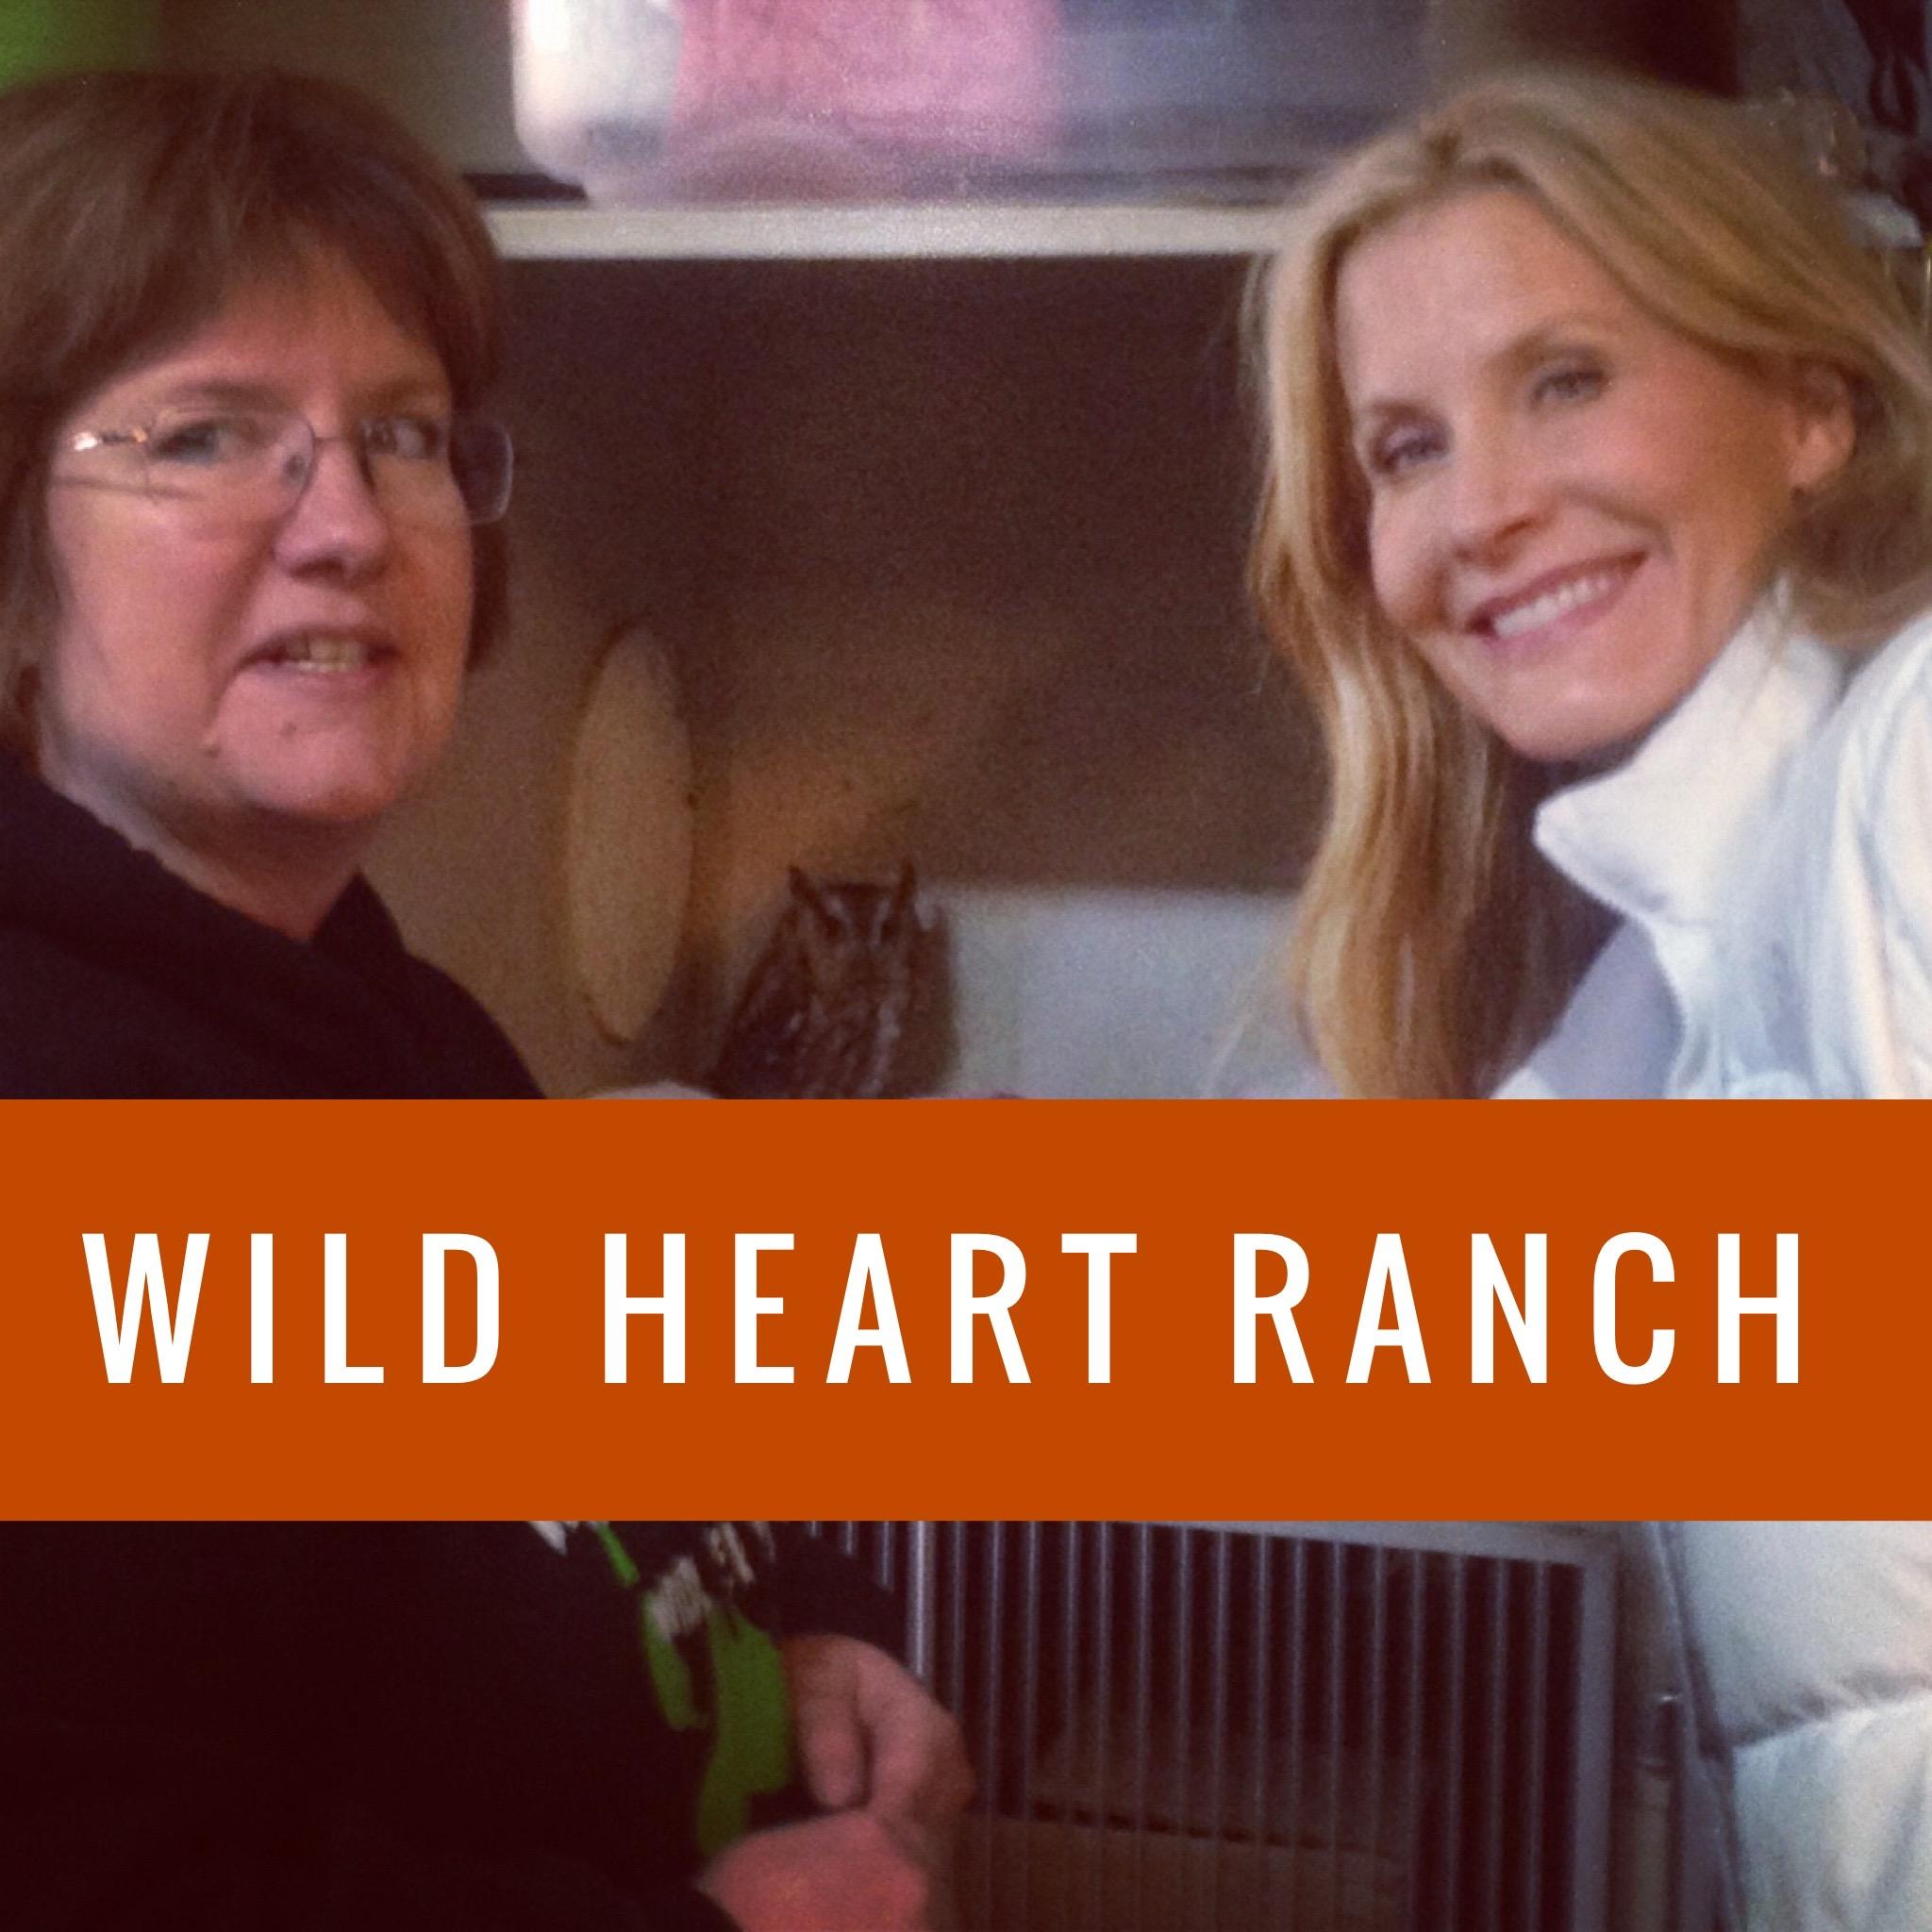 Wild Heart Ranch